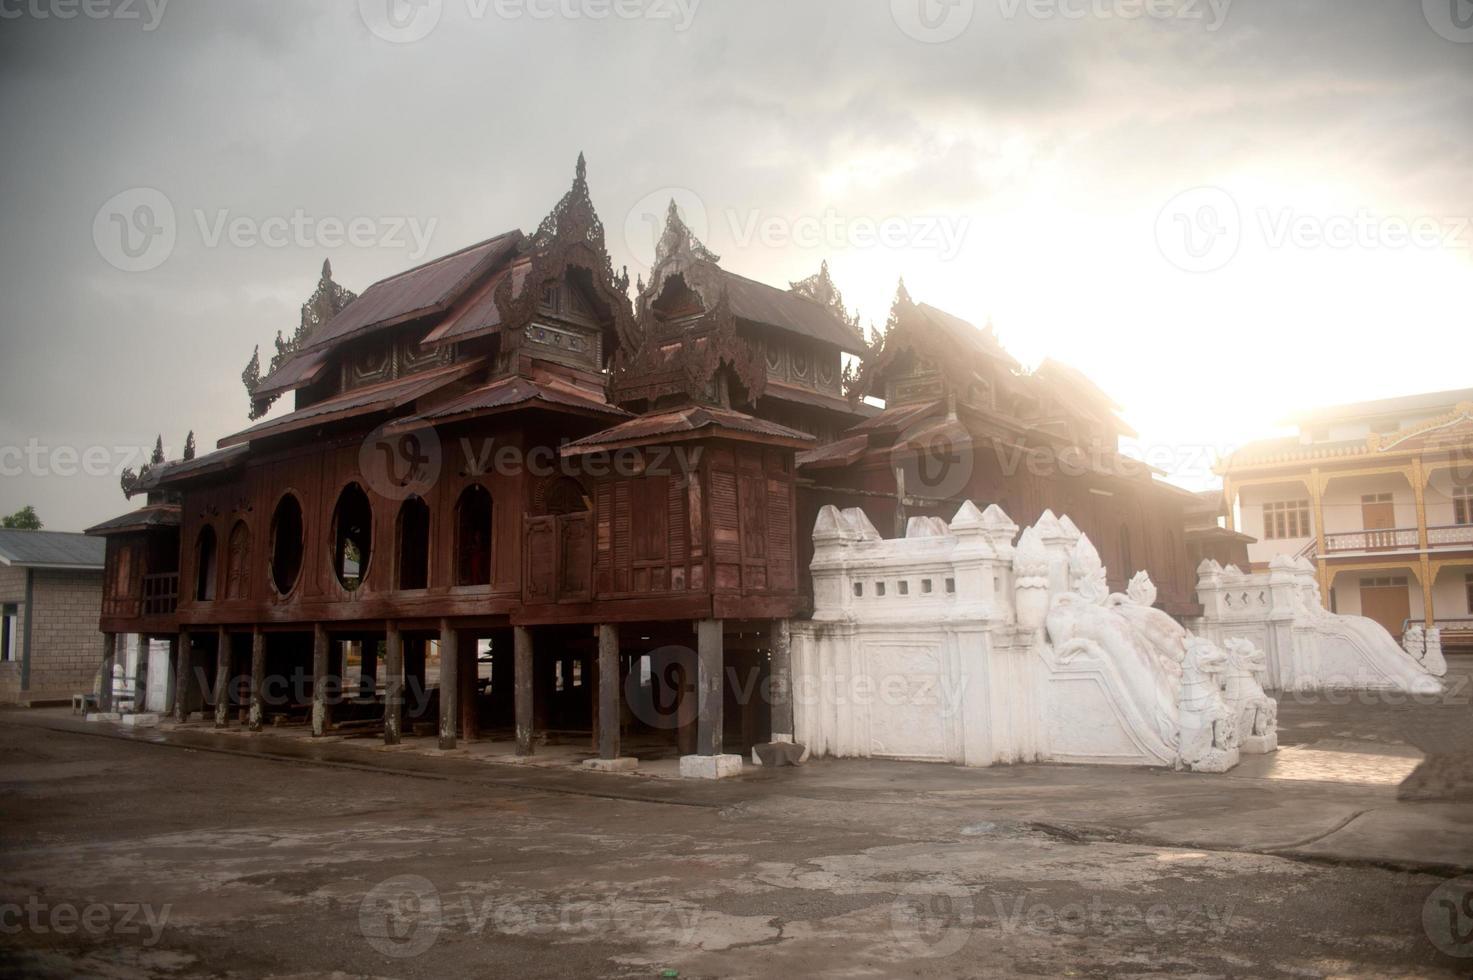 träkyrka i nyan shwe kgua templet i myanmar. foto